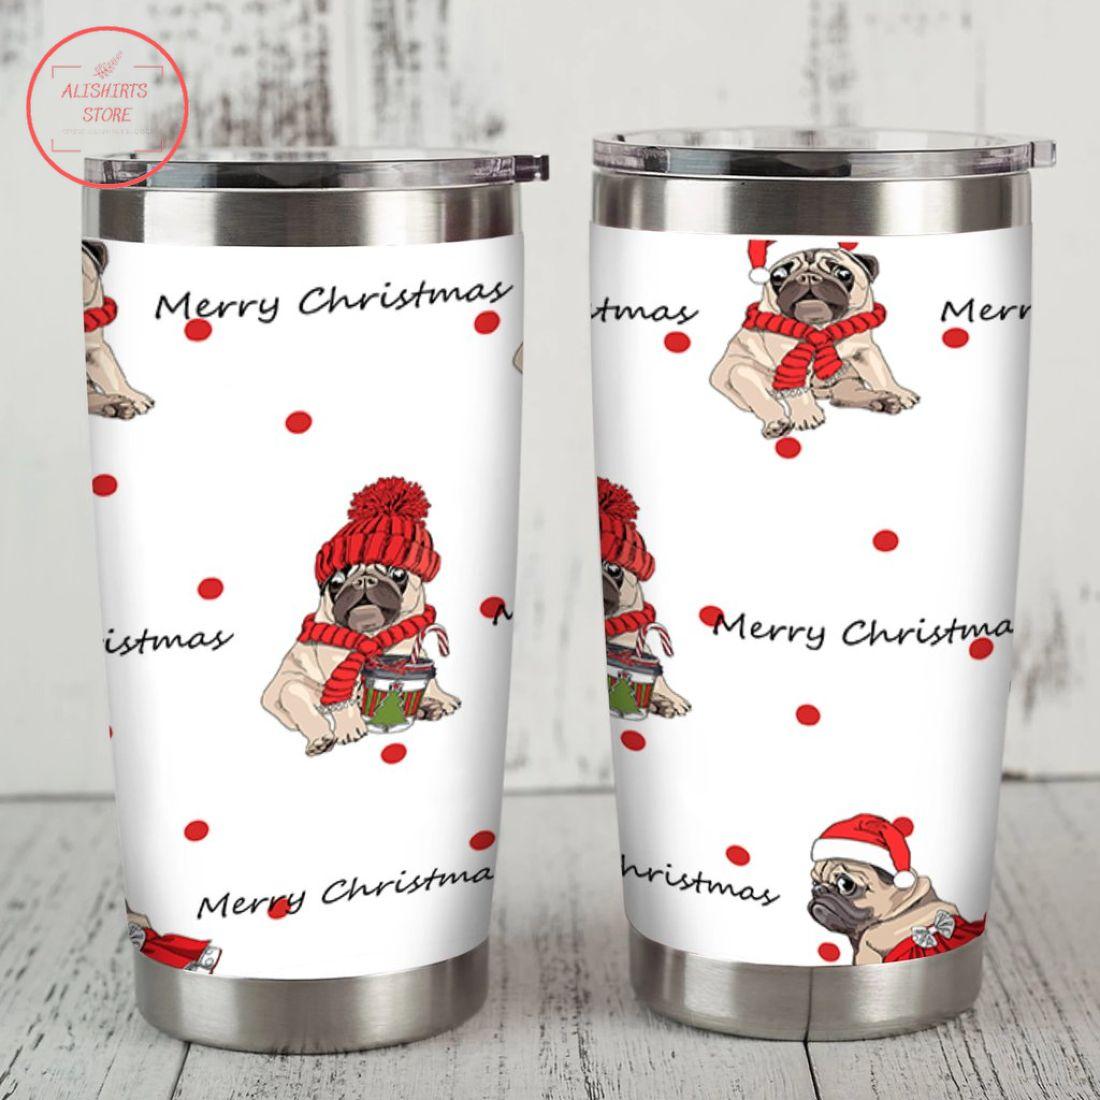 Merry Christmas Pug Dog Stainless Tumbler